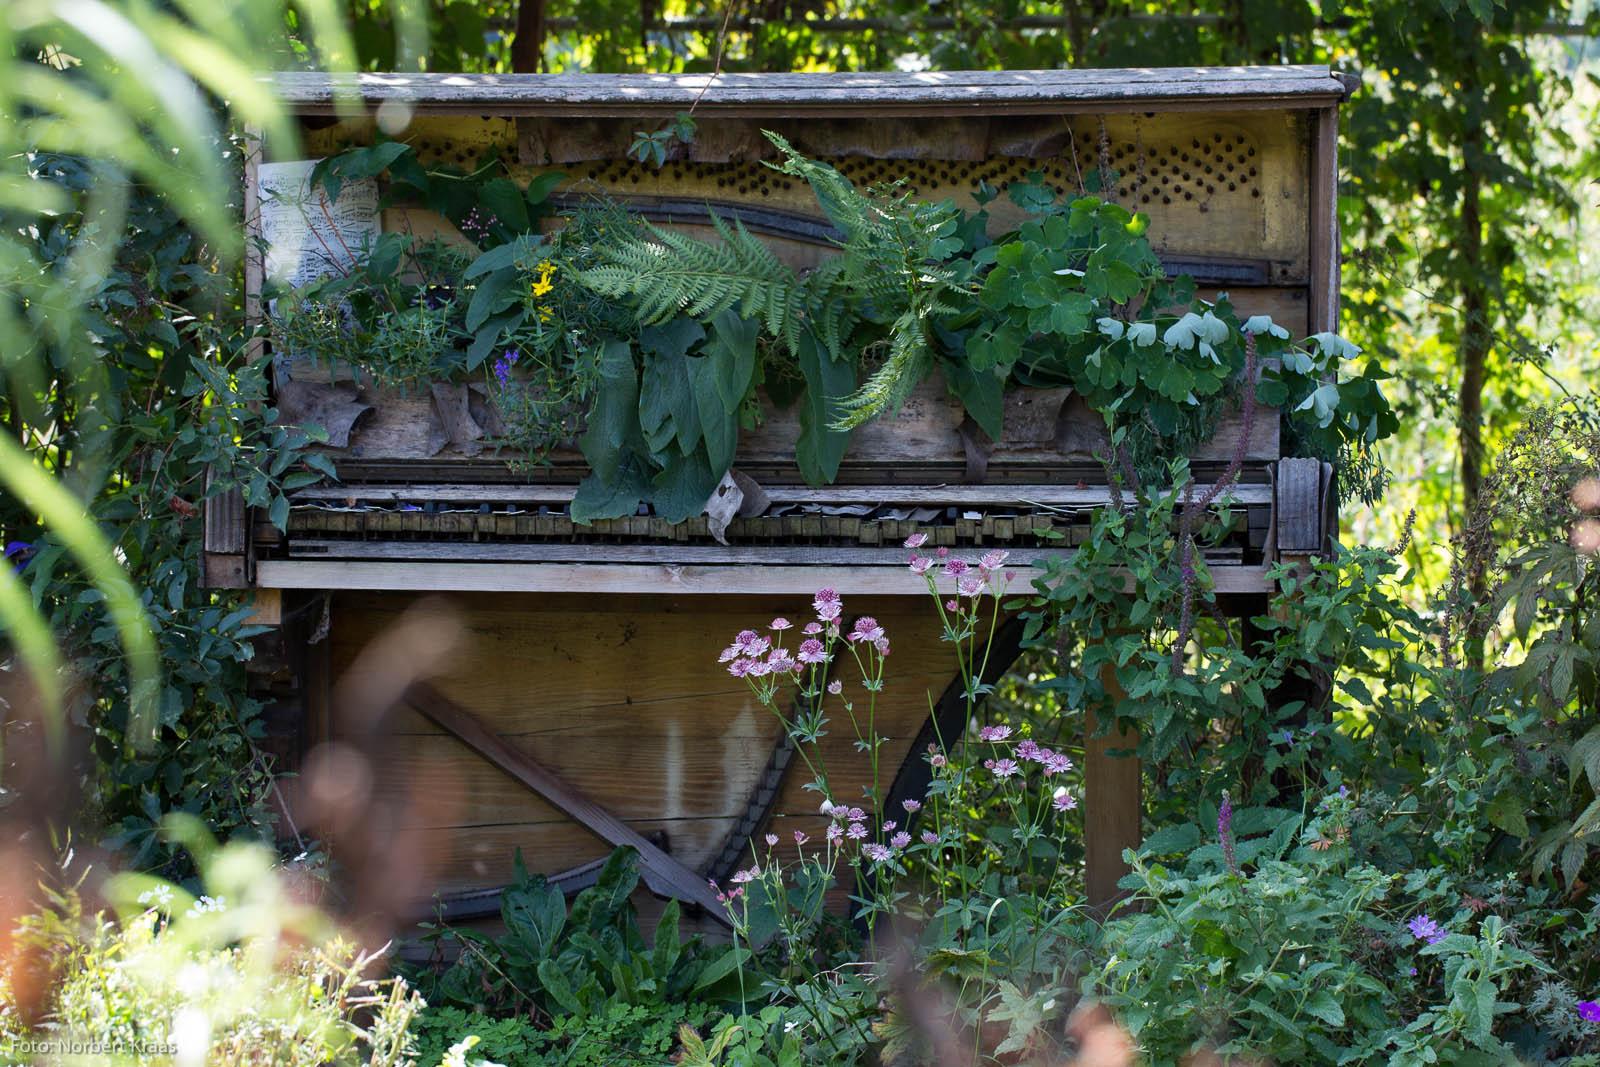 Pflanzenpracht in allen Tönen. Foto: Norbert Kraas